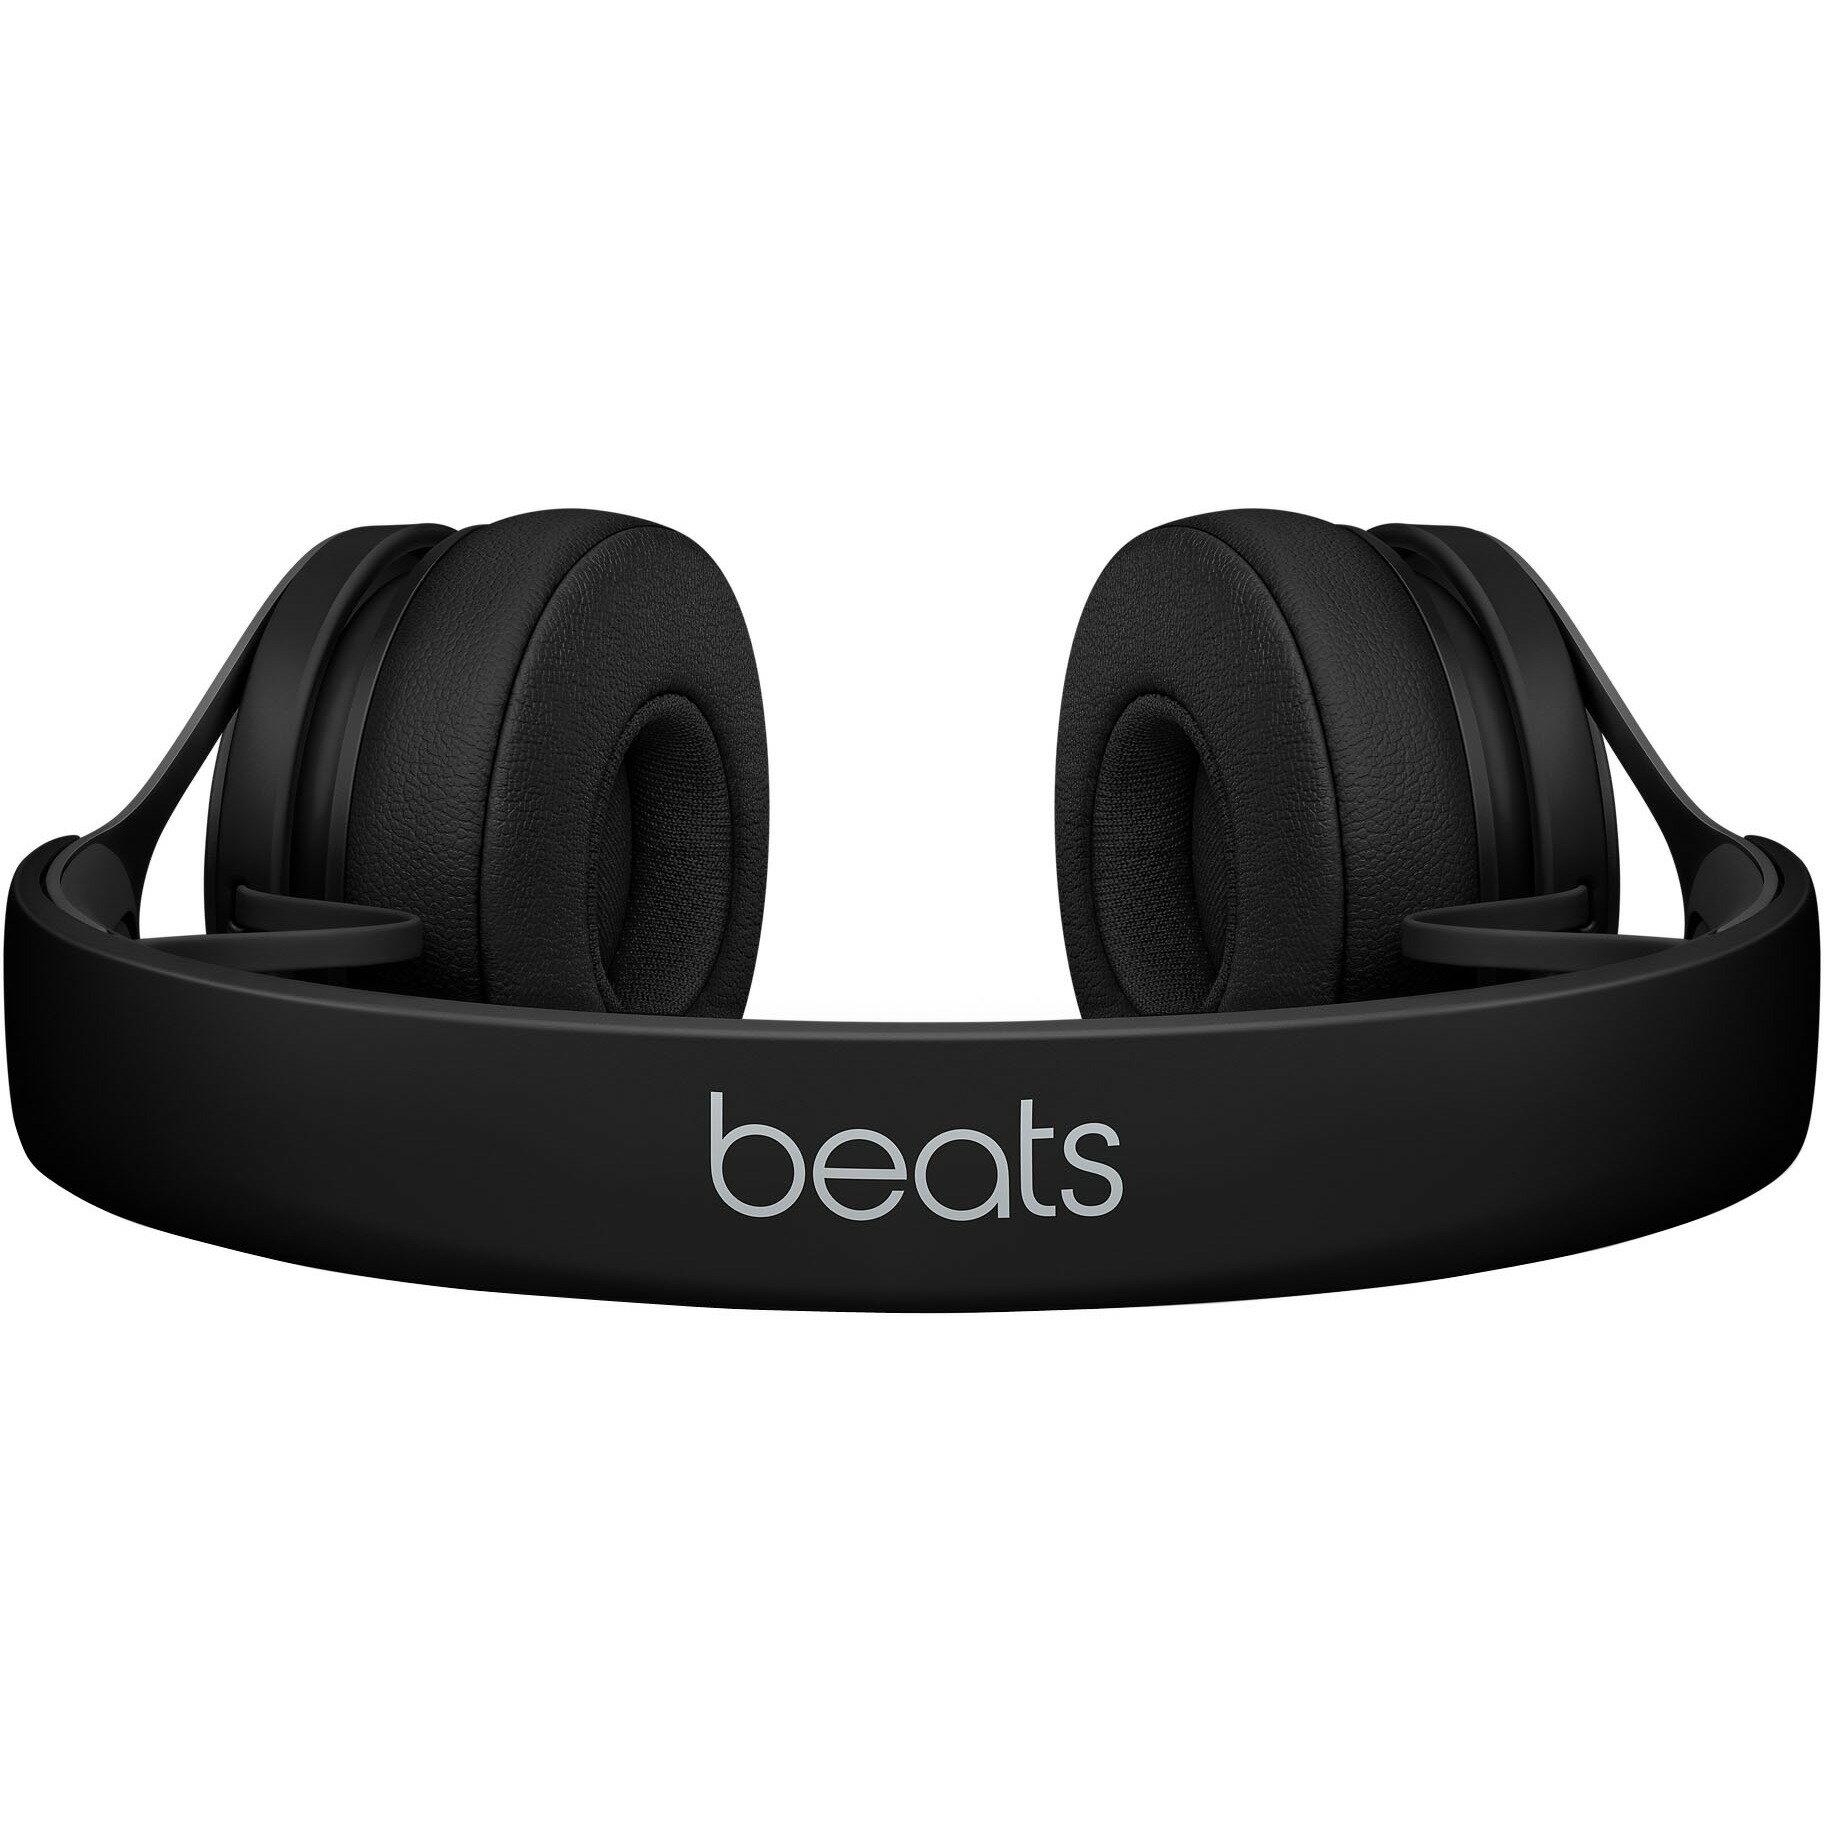 Beats by Dr. Dre EP On-Ear Headphones - Black - Stereo - Black - Mini-phone - Wired - Over-the-head - Binaural - Supra-aural 3